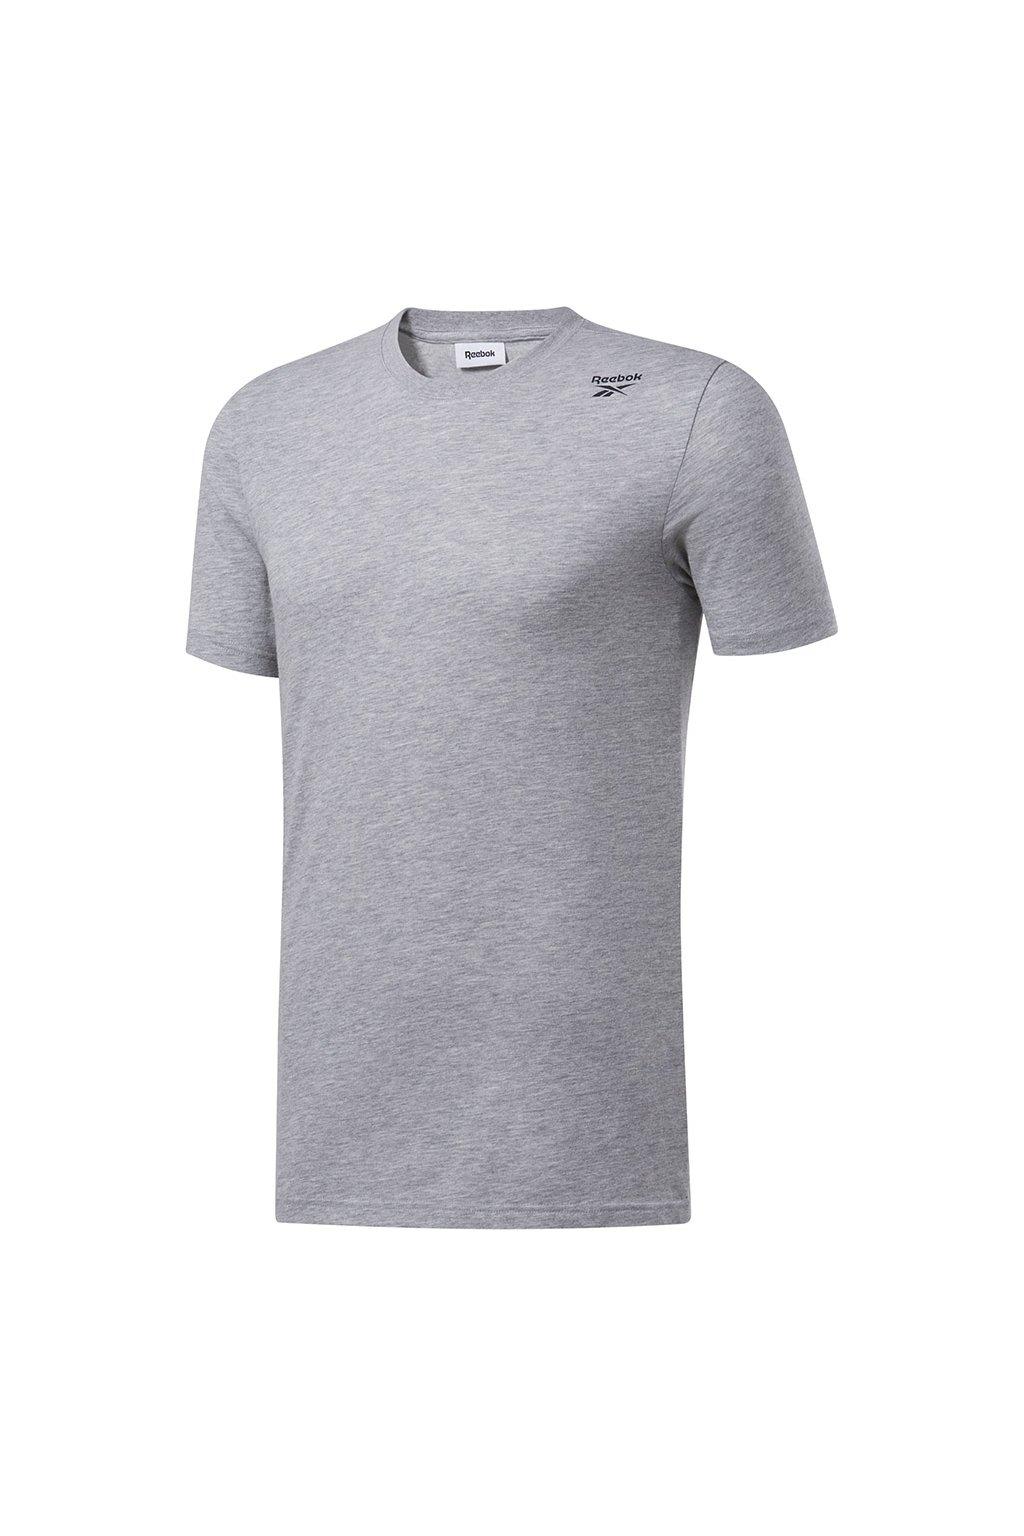 Pánske tričko Reebok Training Essentials SL Classic Tee šedé FP9183